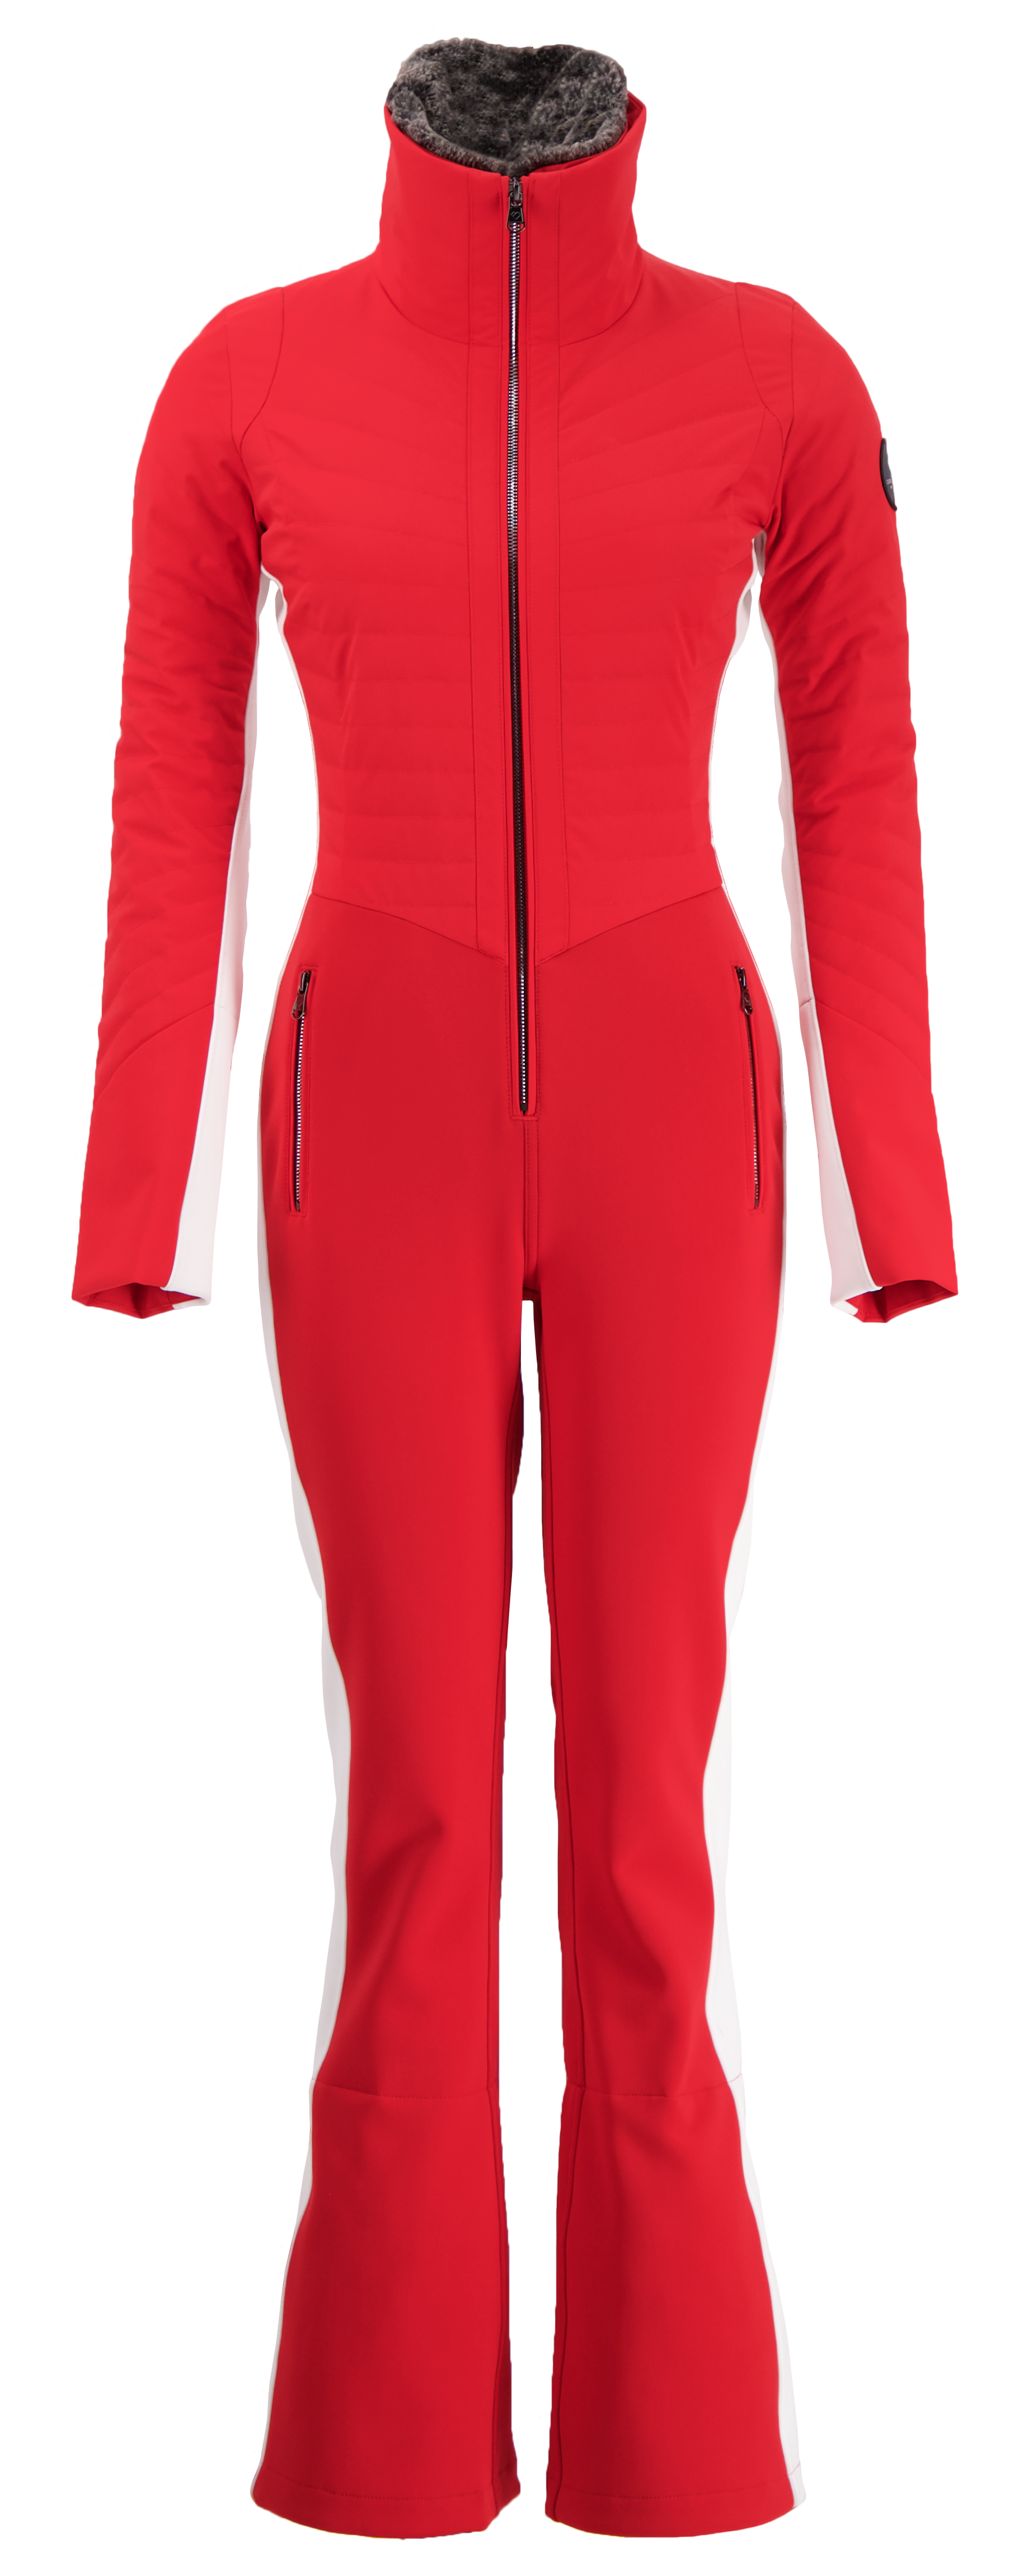 20170308-skitest-allmtnnarrow-9403